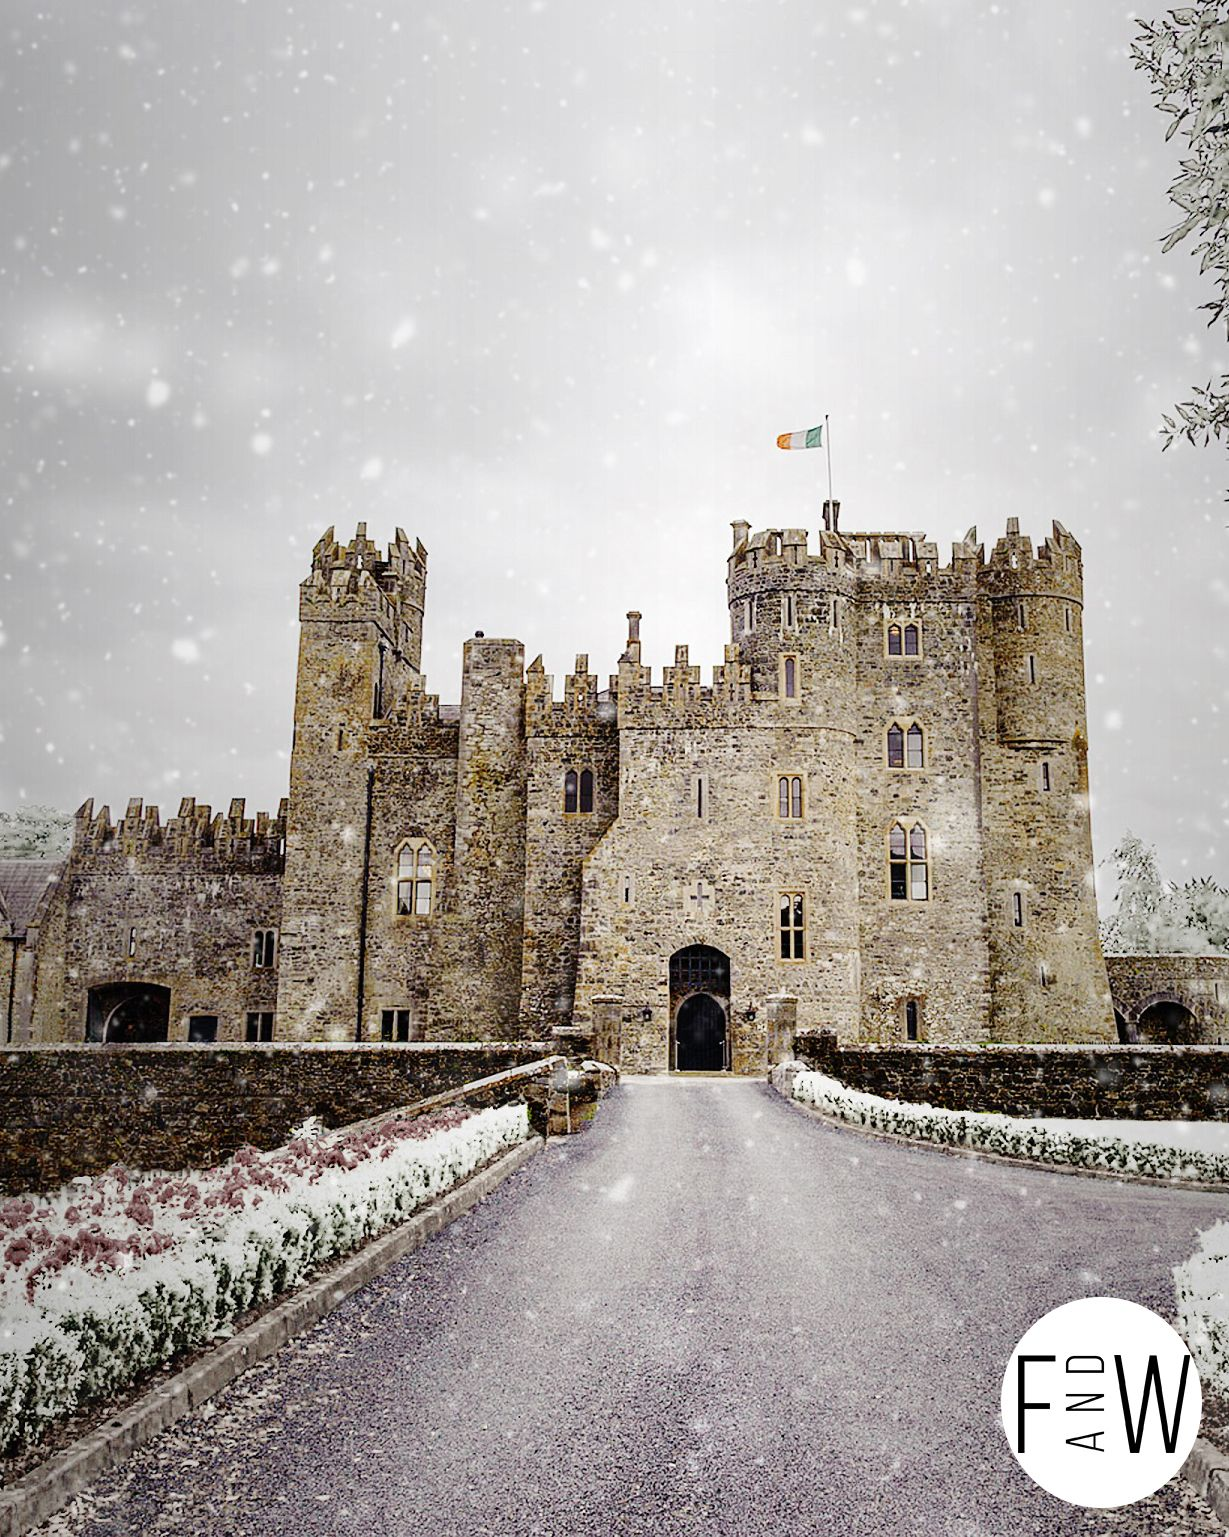 Kilkea_castle_snow_edit_with_logo